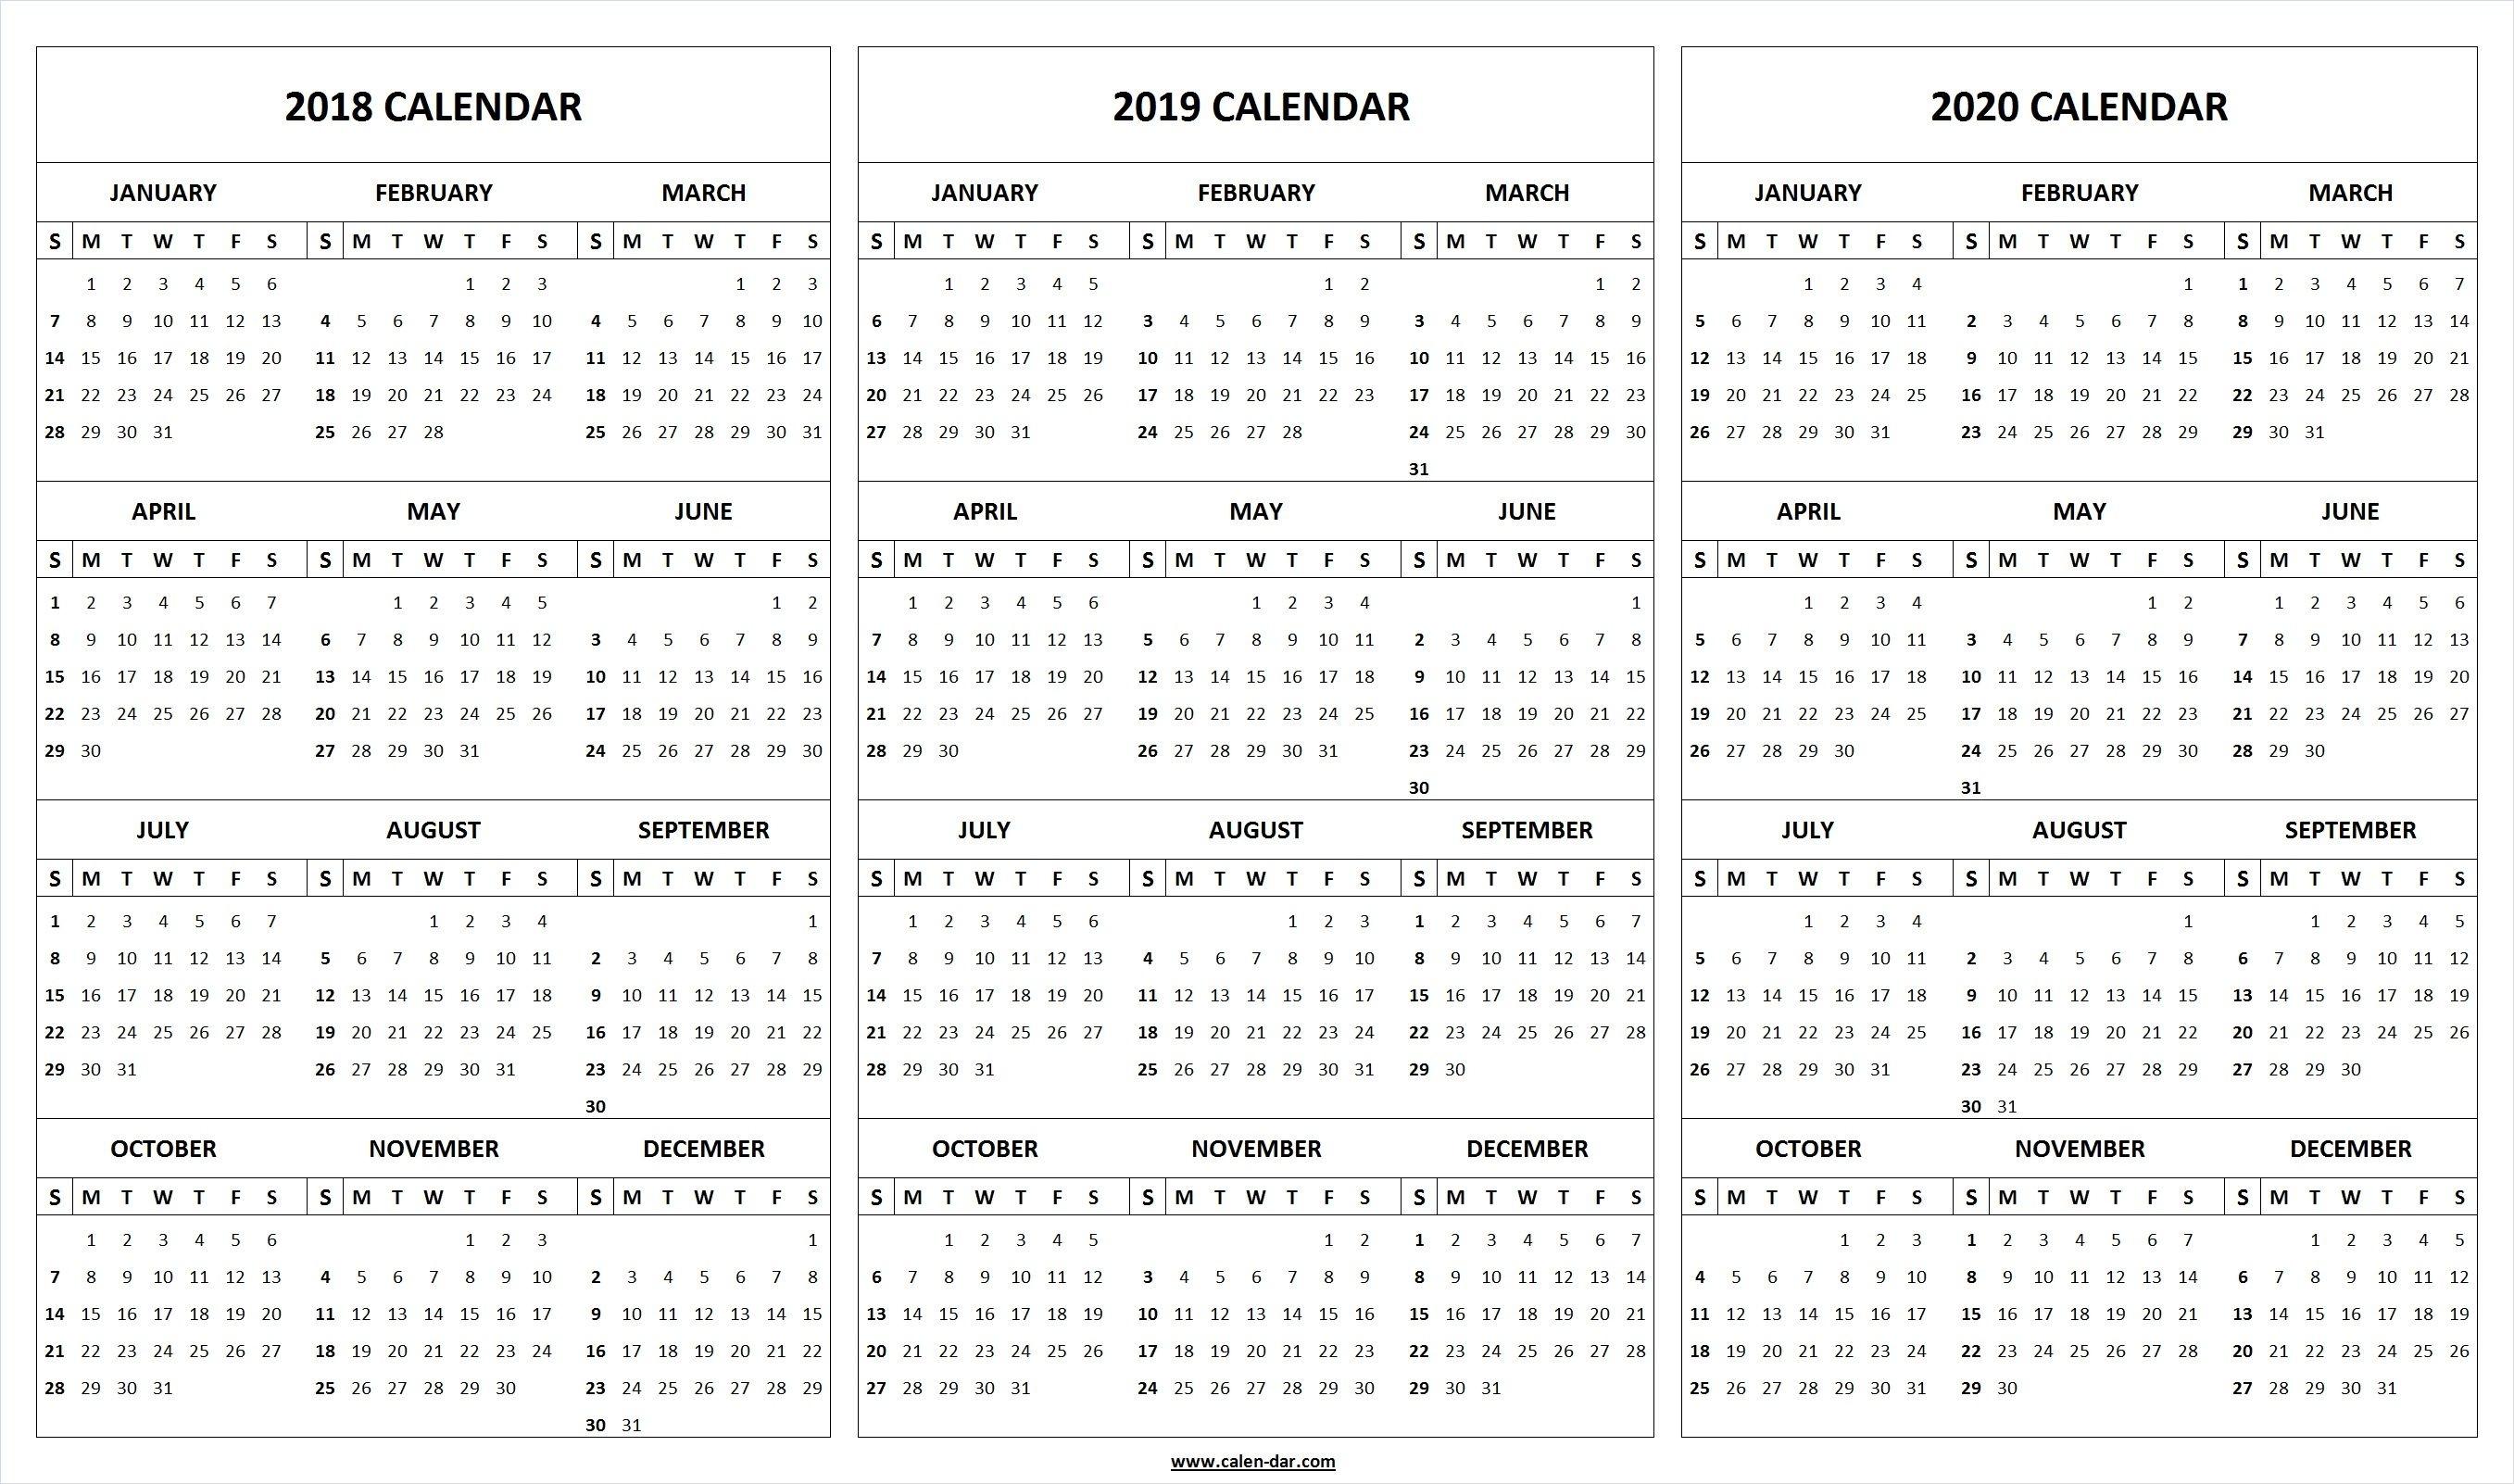 Print Blank 2018 2019 2020 Calendar Template | Organize! | Printable with 2019-2020 Blank Calendar To Print